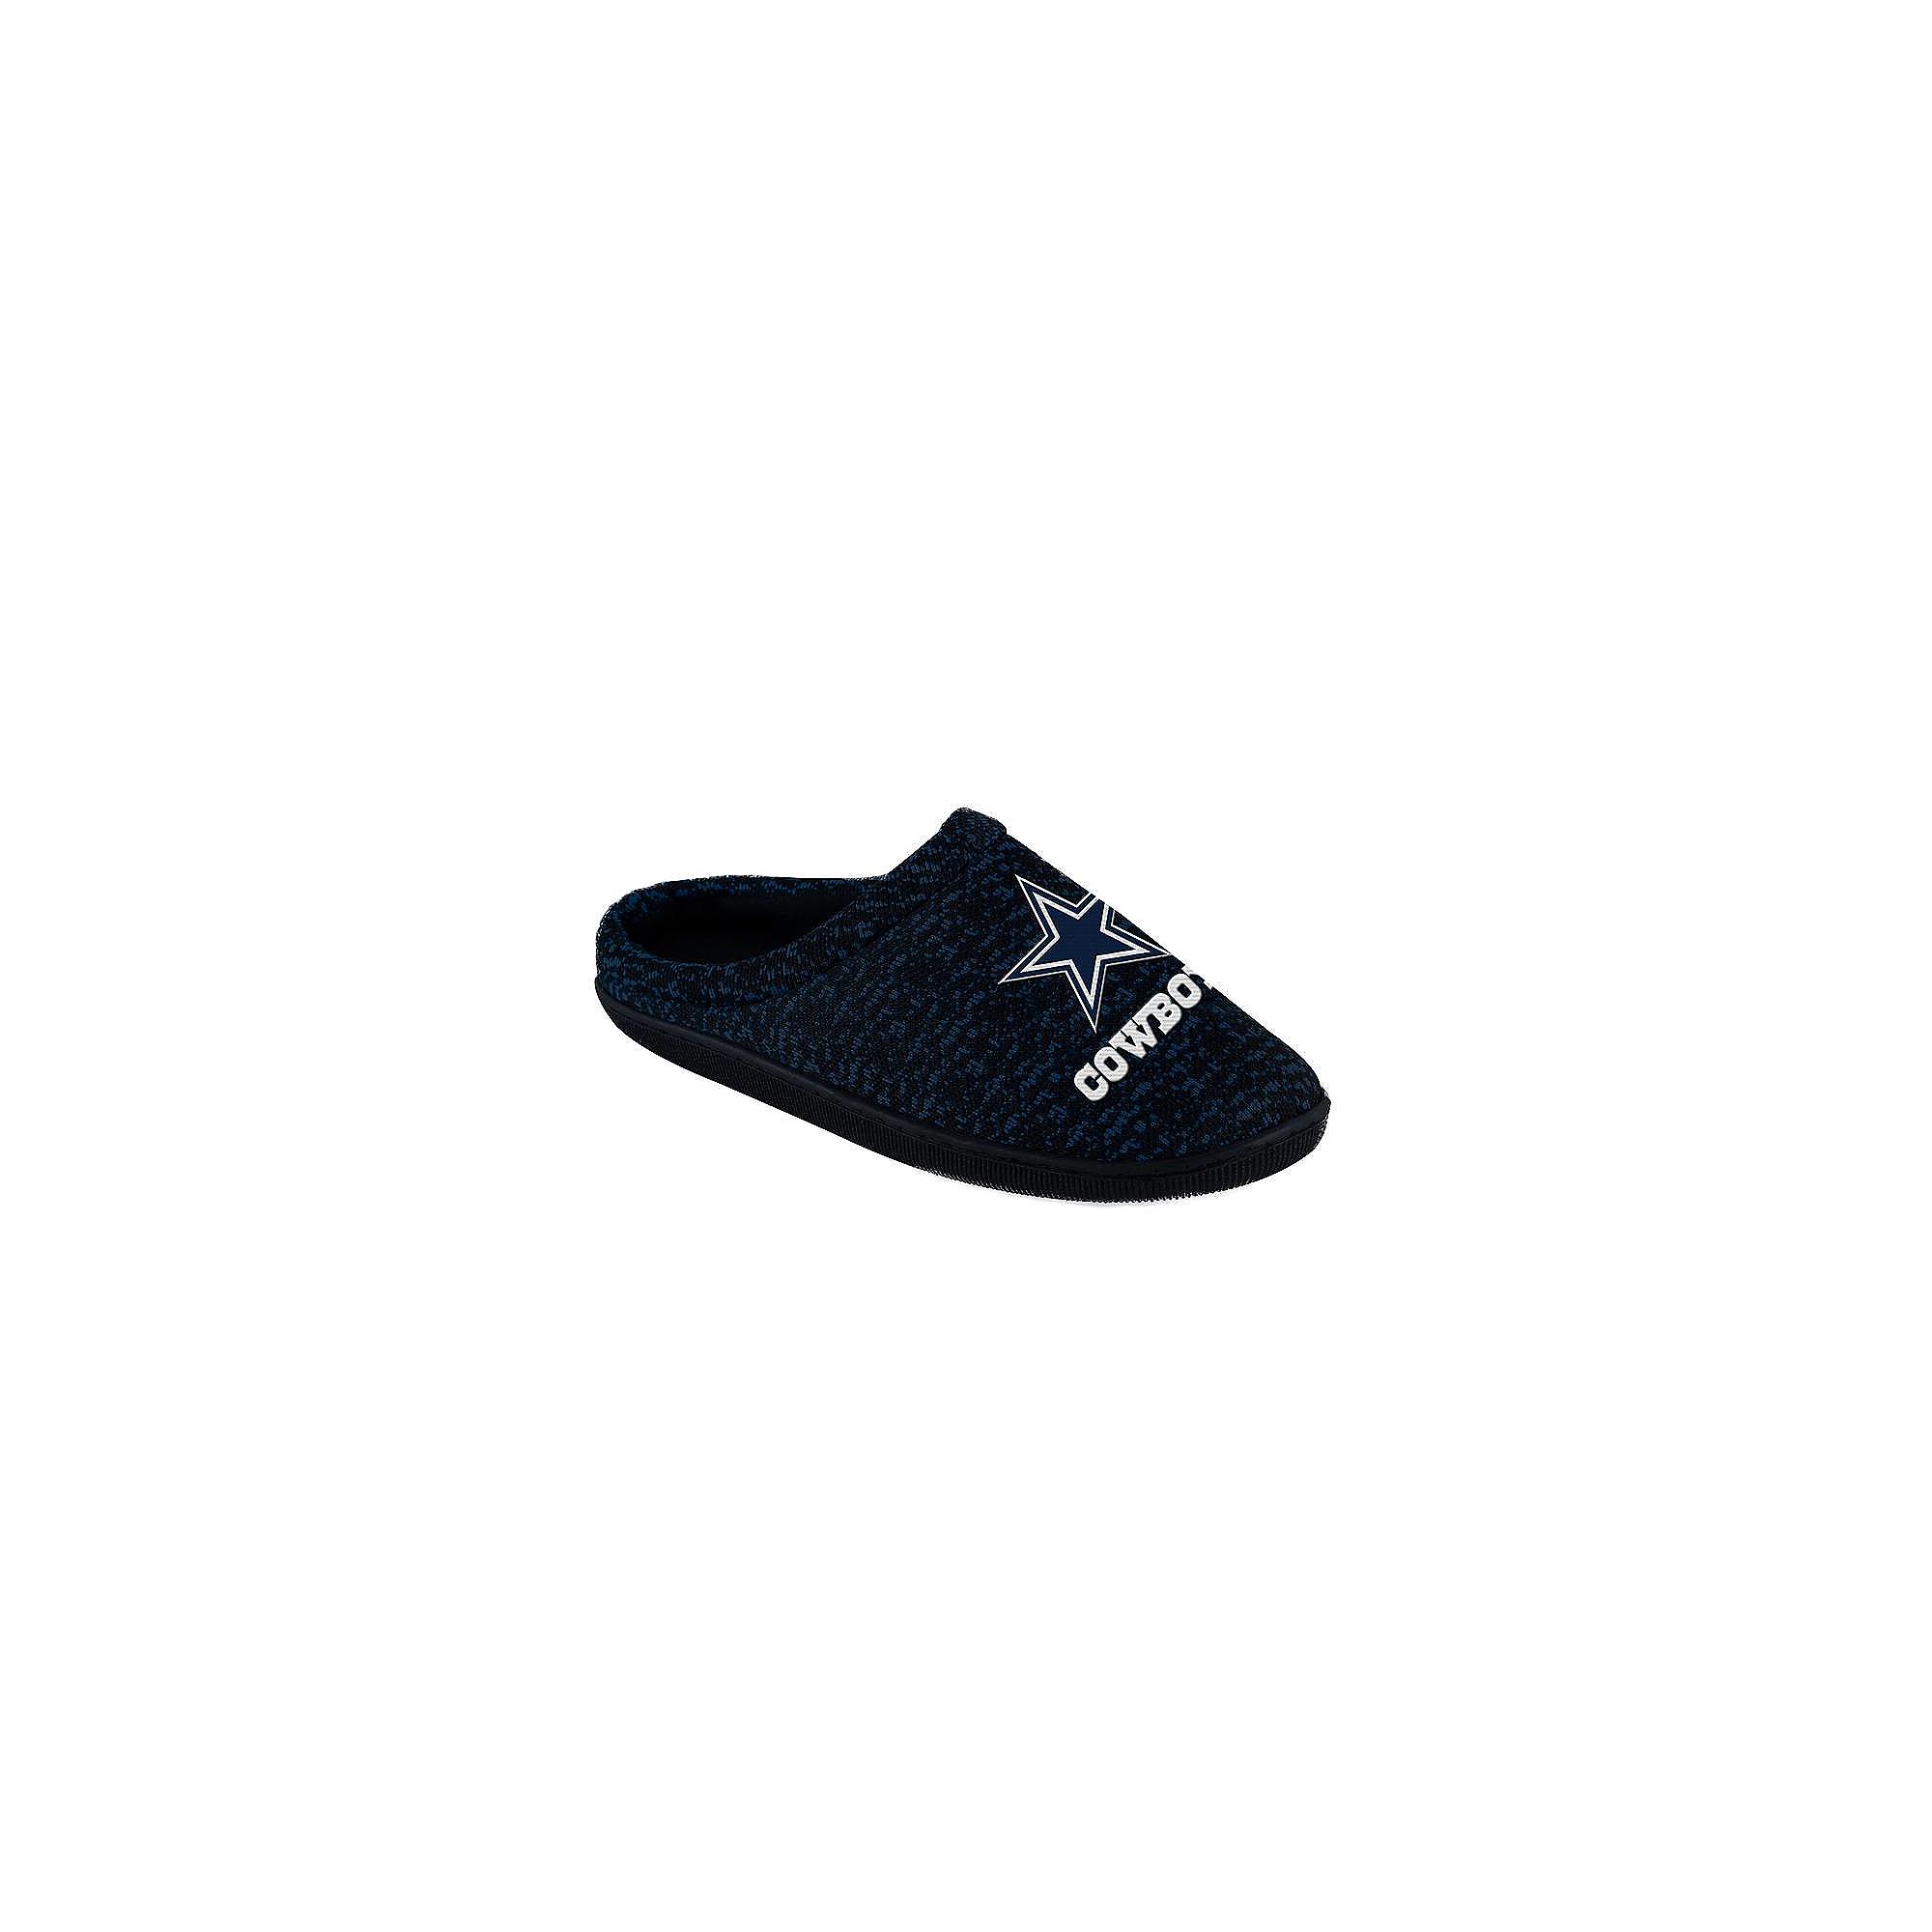 Dallas Cowboys Men's Sole Slippers - Size Medium